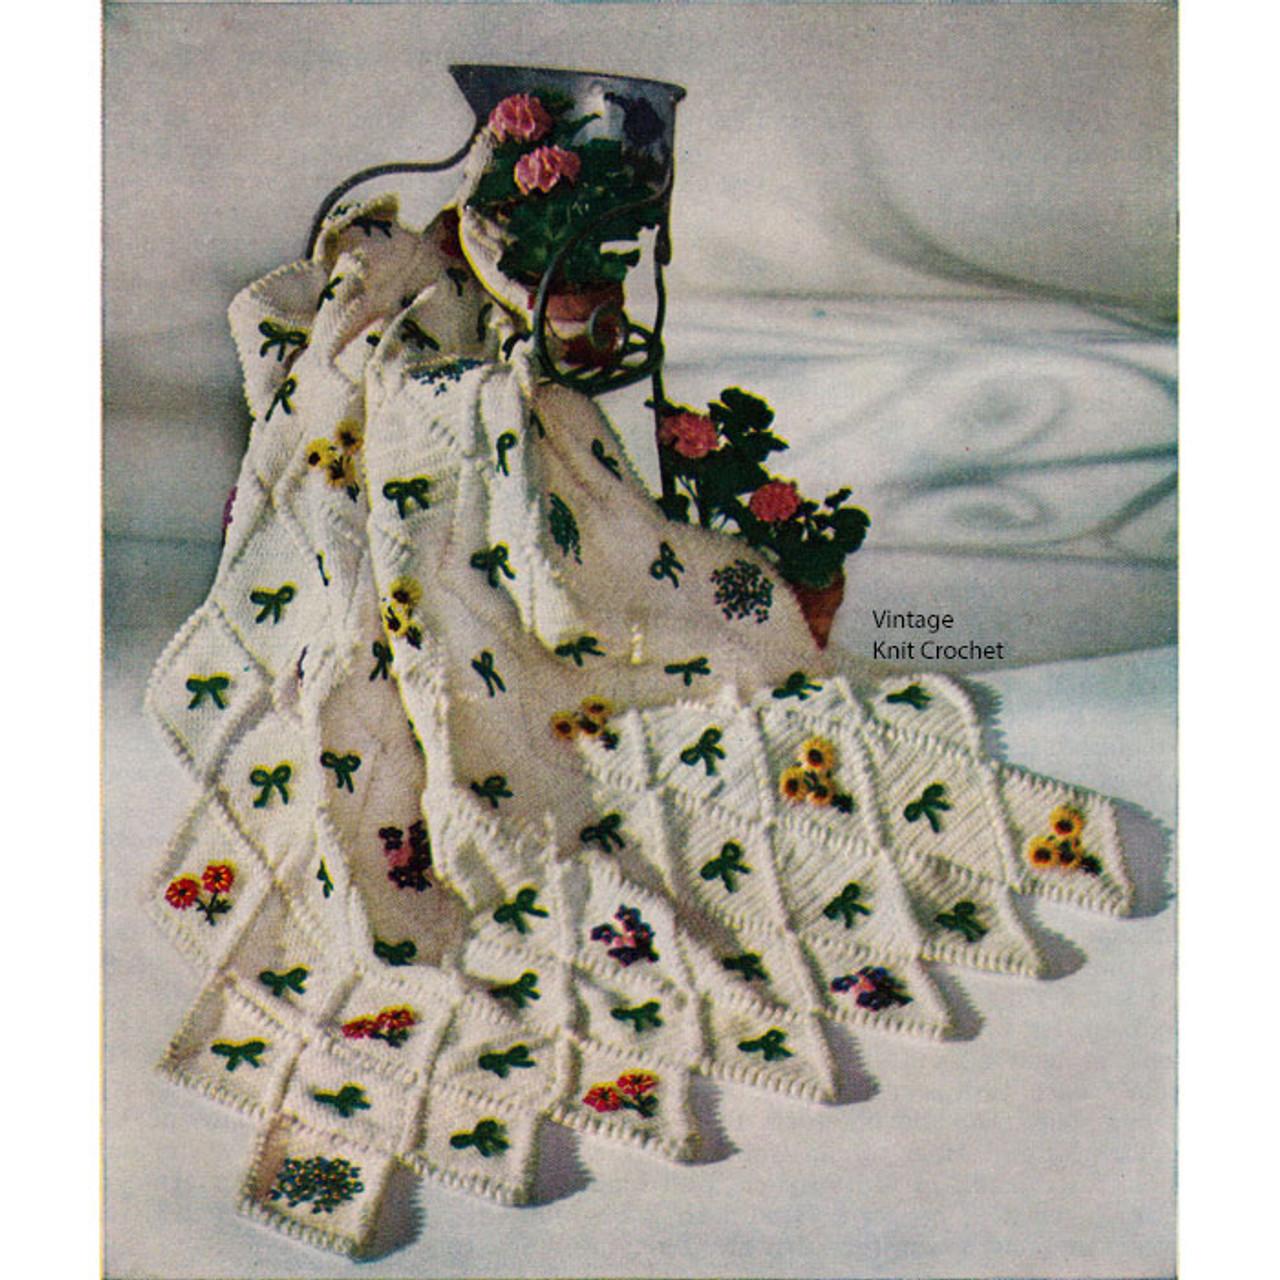 Flower Garden Crocheted Afghan Pattern